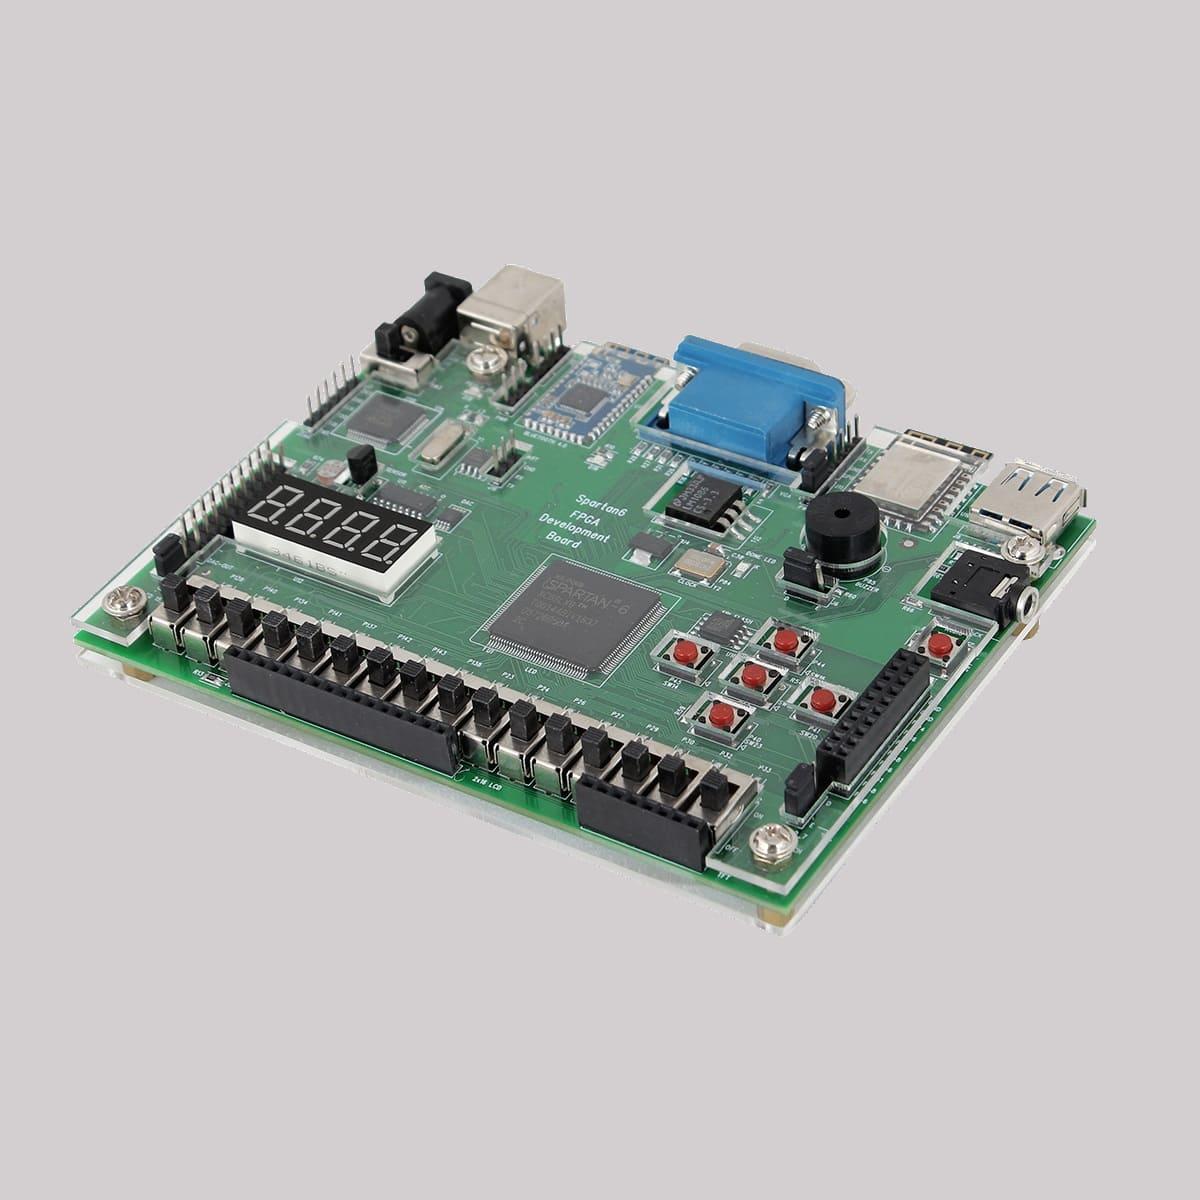 EDGE Spartan 6 FPGA Development Board